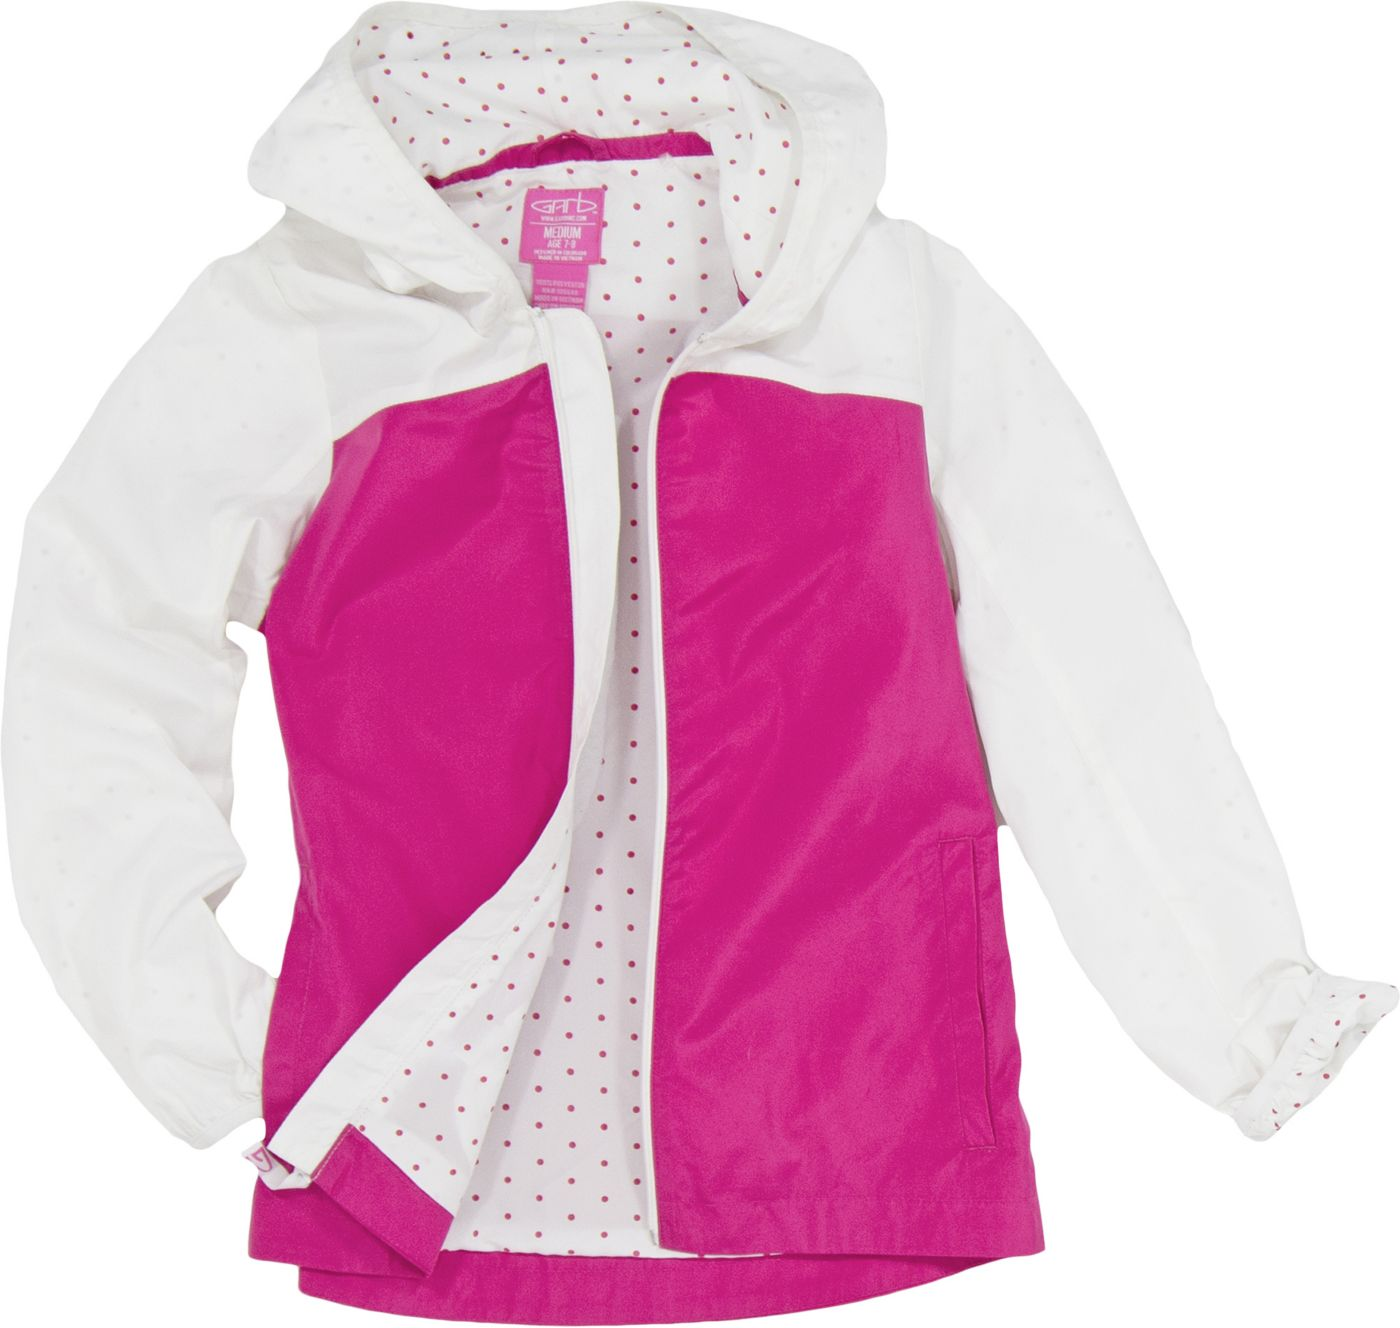 Garb Girls' Toddler Brooklyn Full-Zip Golf Jacket